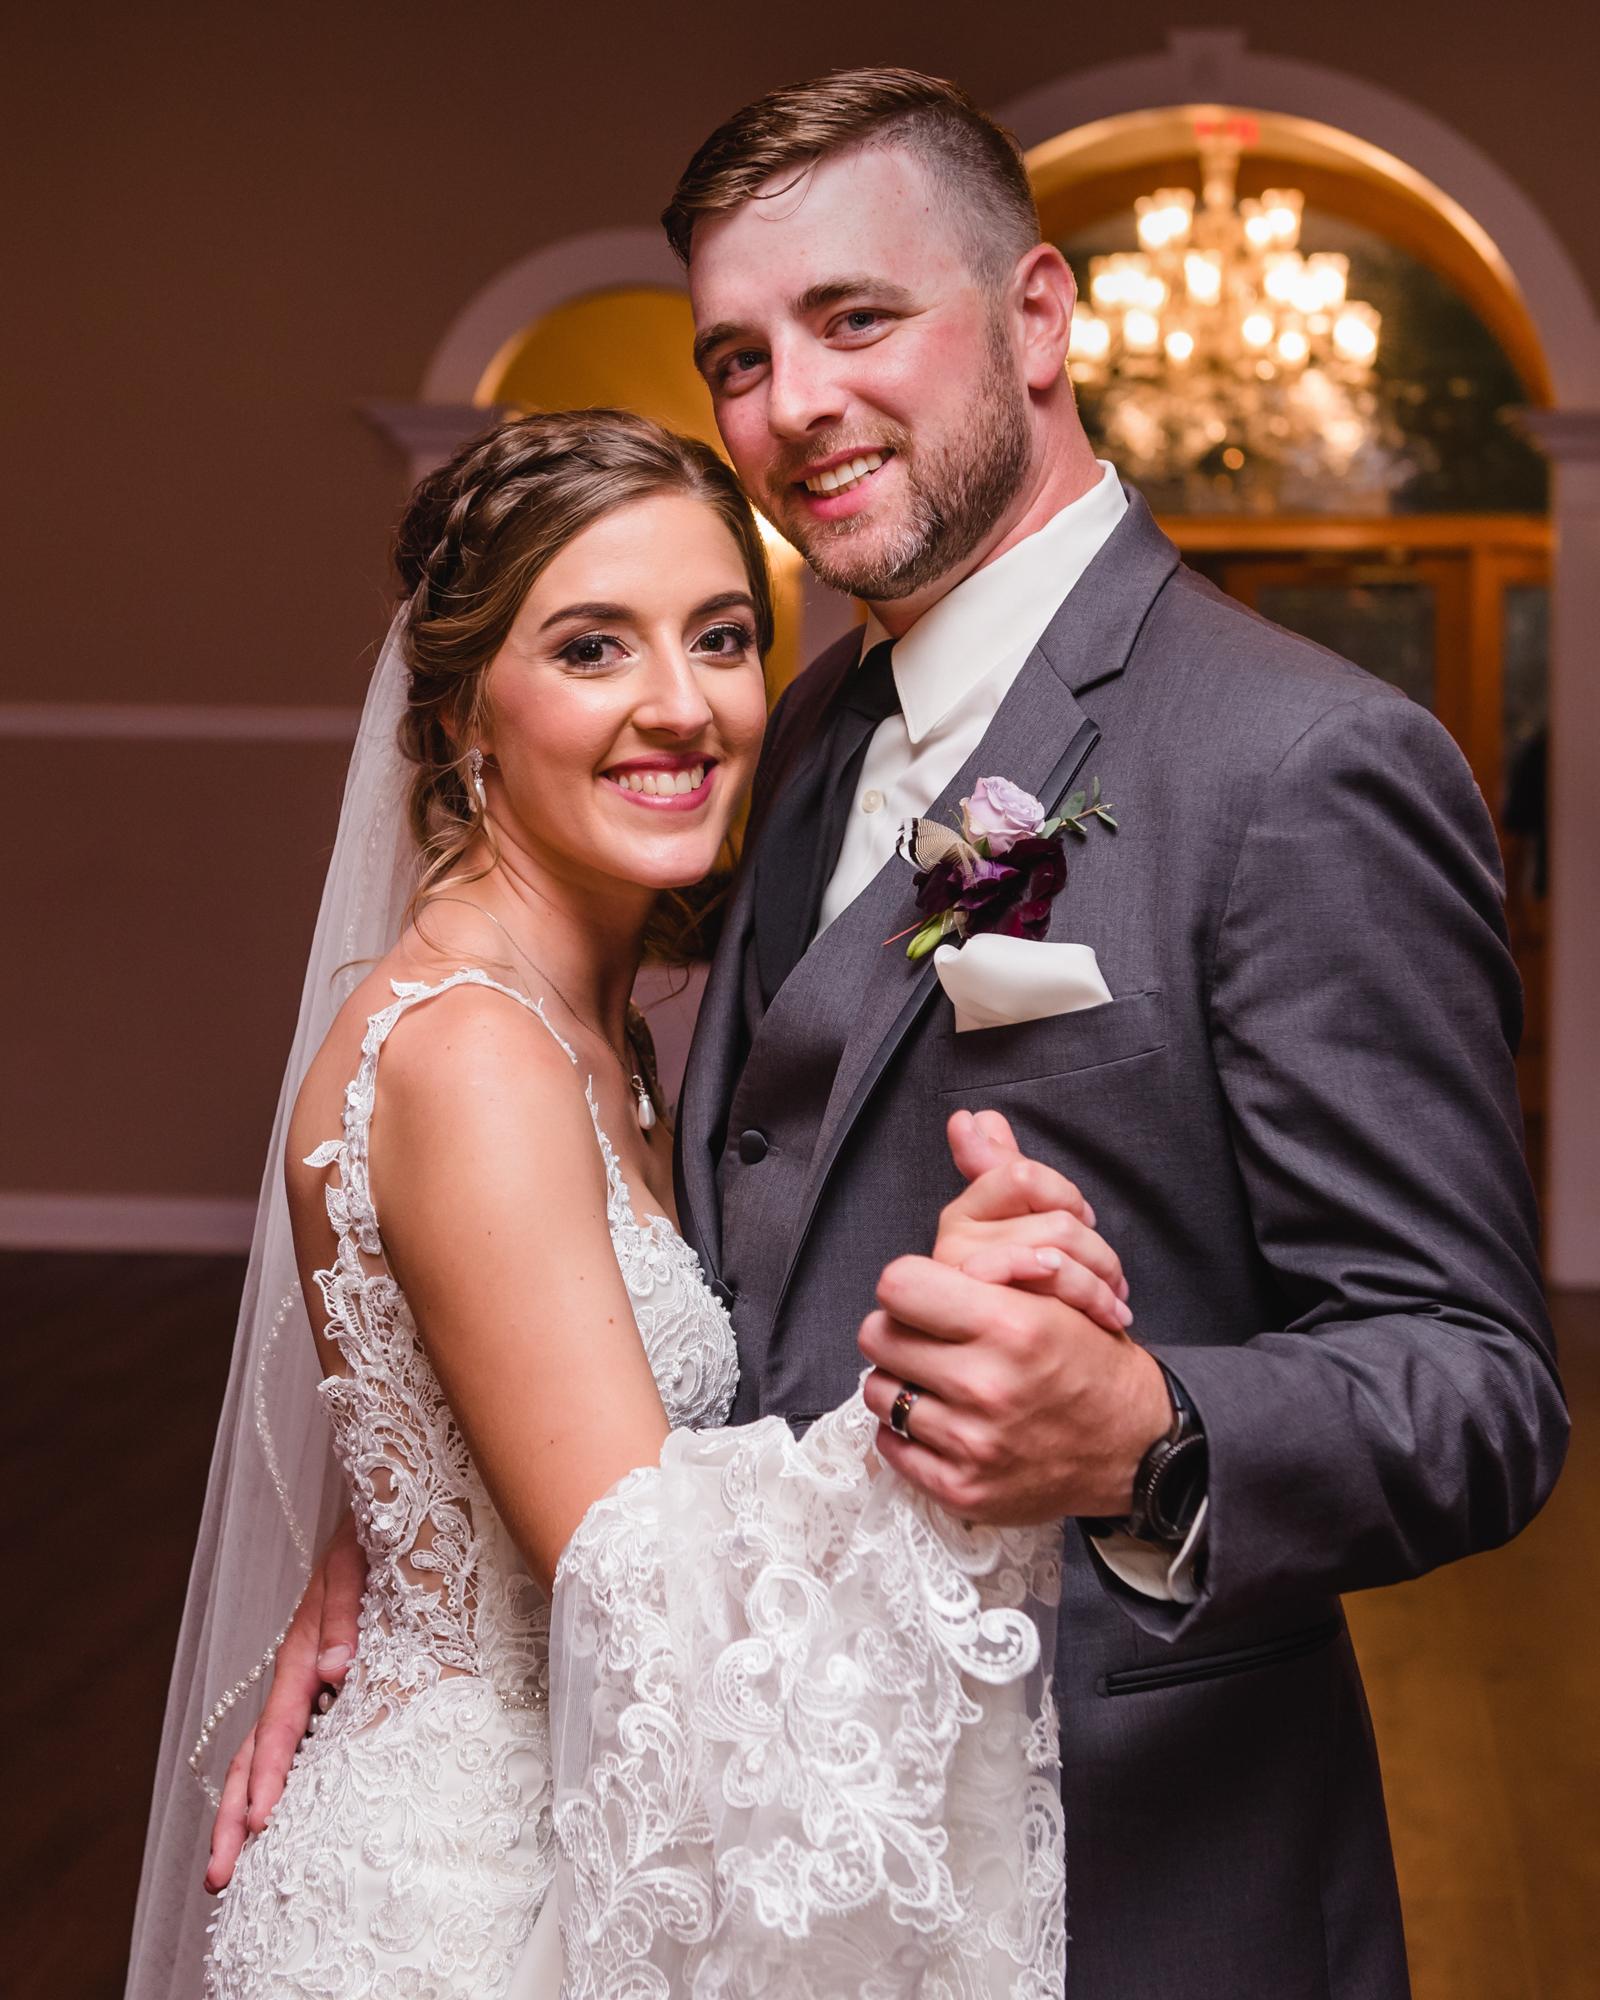 wedding-photographer-baton-rouge-2-3.jpg